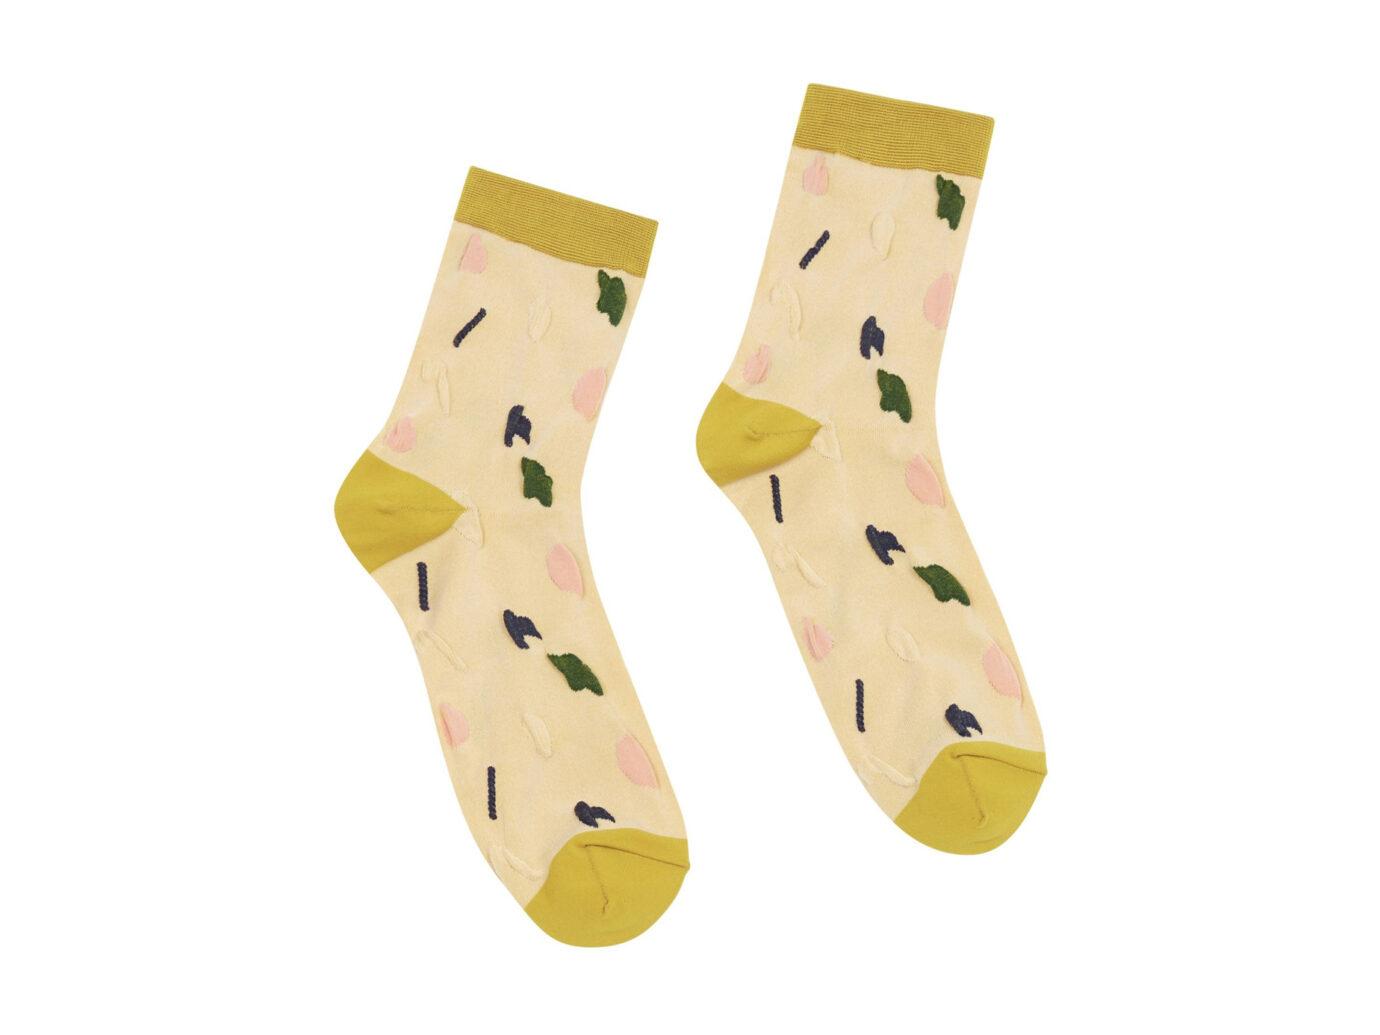 Hansel-from-Basel-oddities-socks